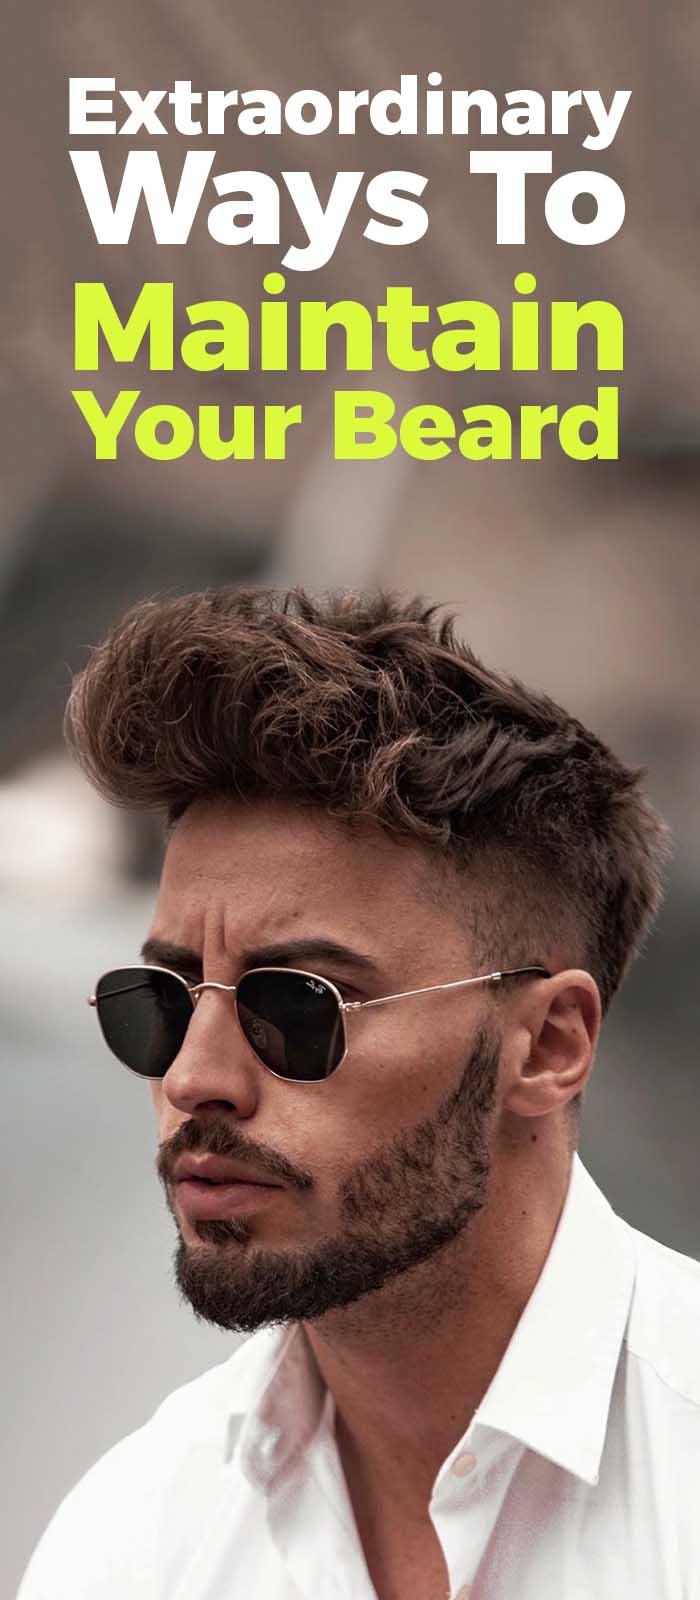 Ways To Maintain Your Beard.